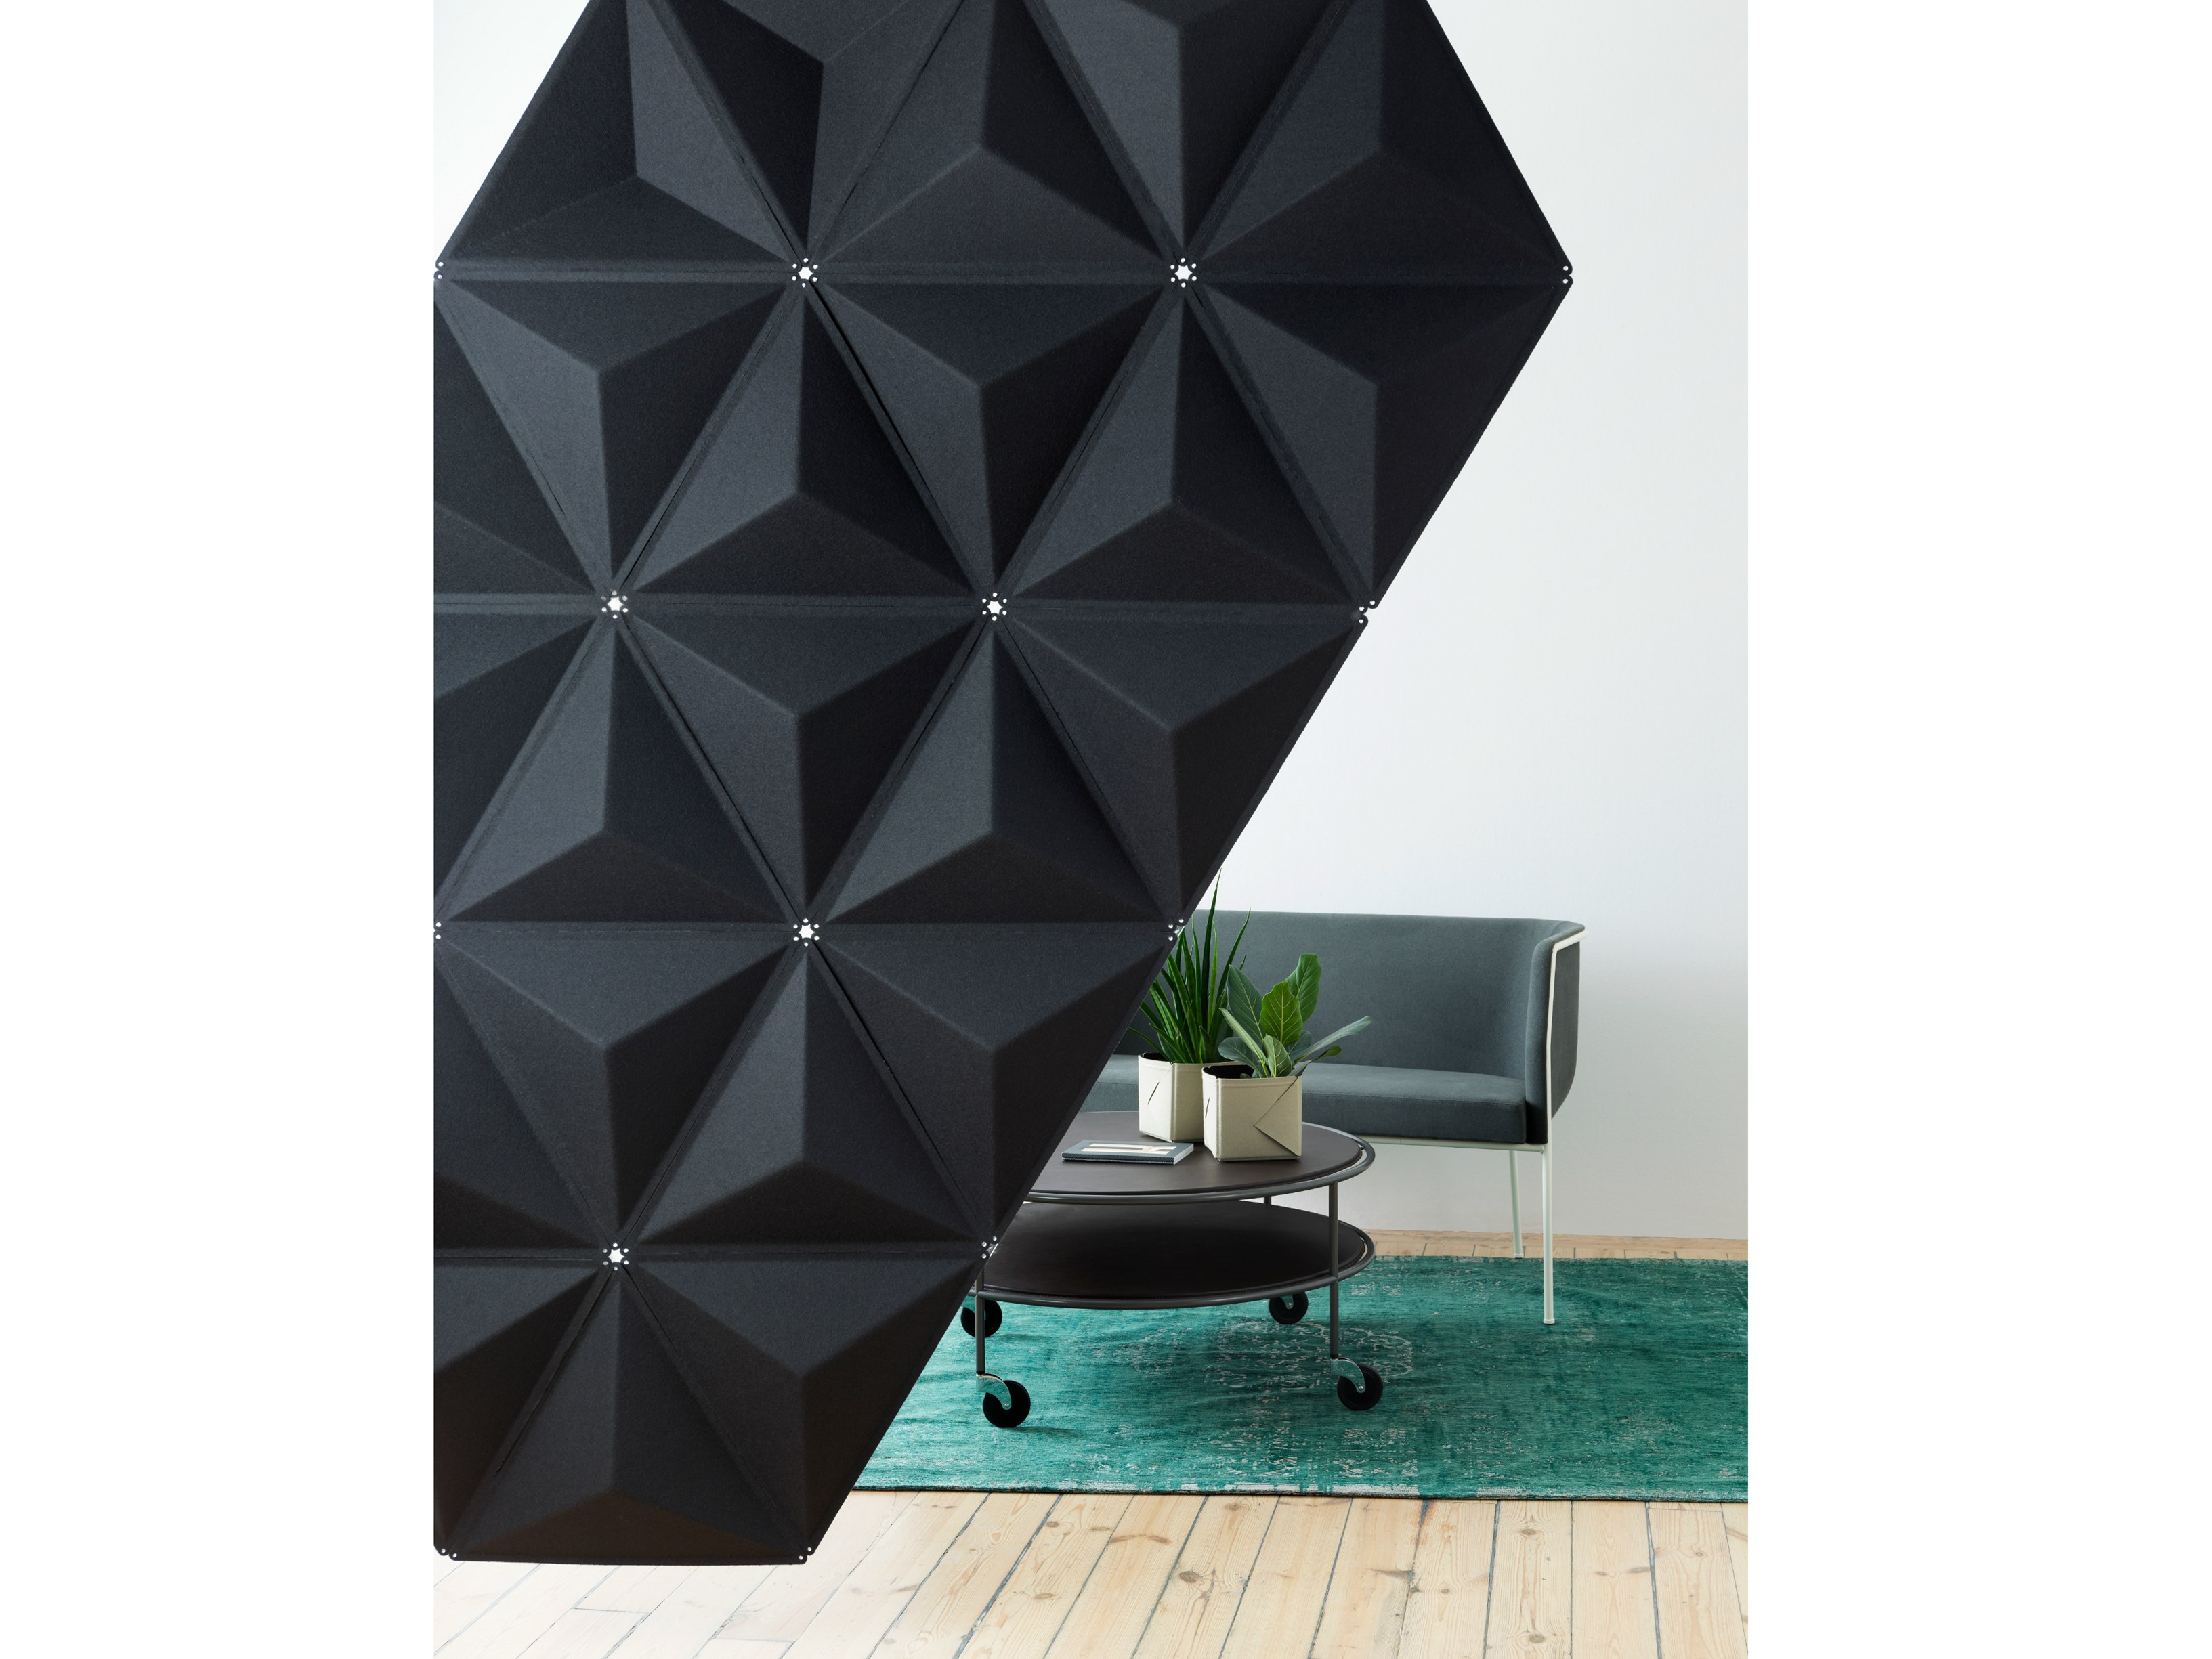 panneau s parateur insonorisant modulable aircone by. Black Bedroom Furniture Sets. Home Design Ideas